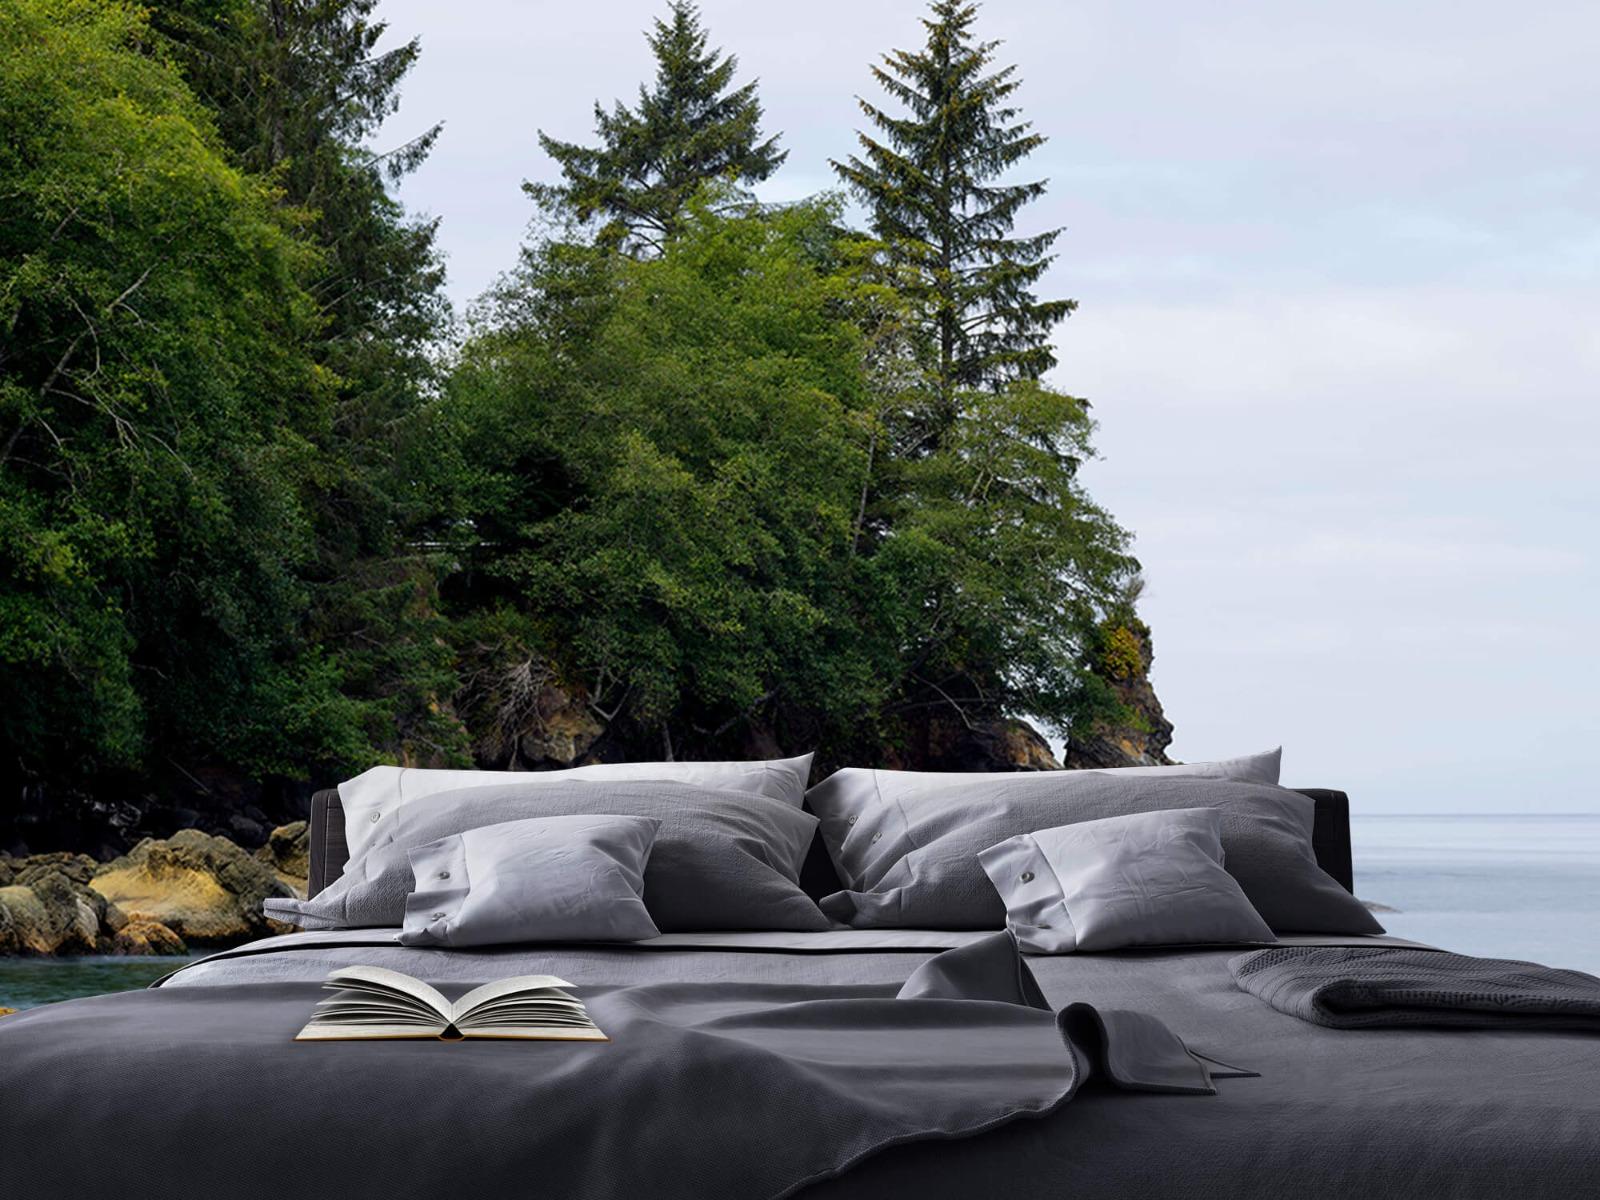 Bomen - Ruwe kustlijn - Slaapkamer 8